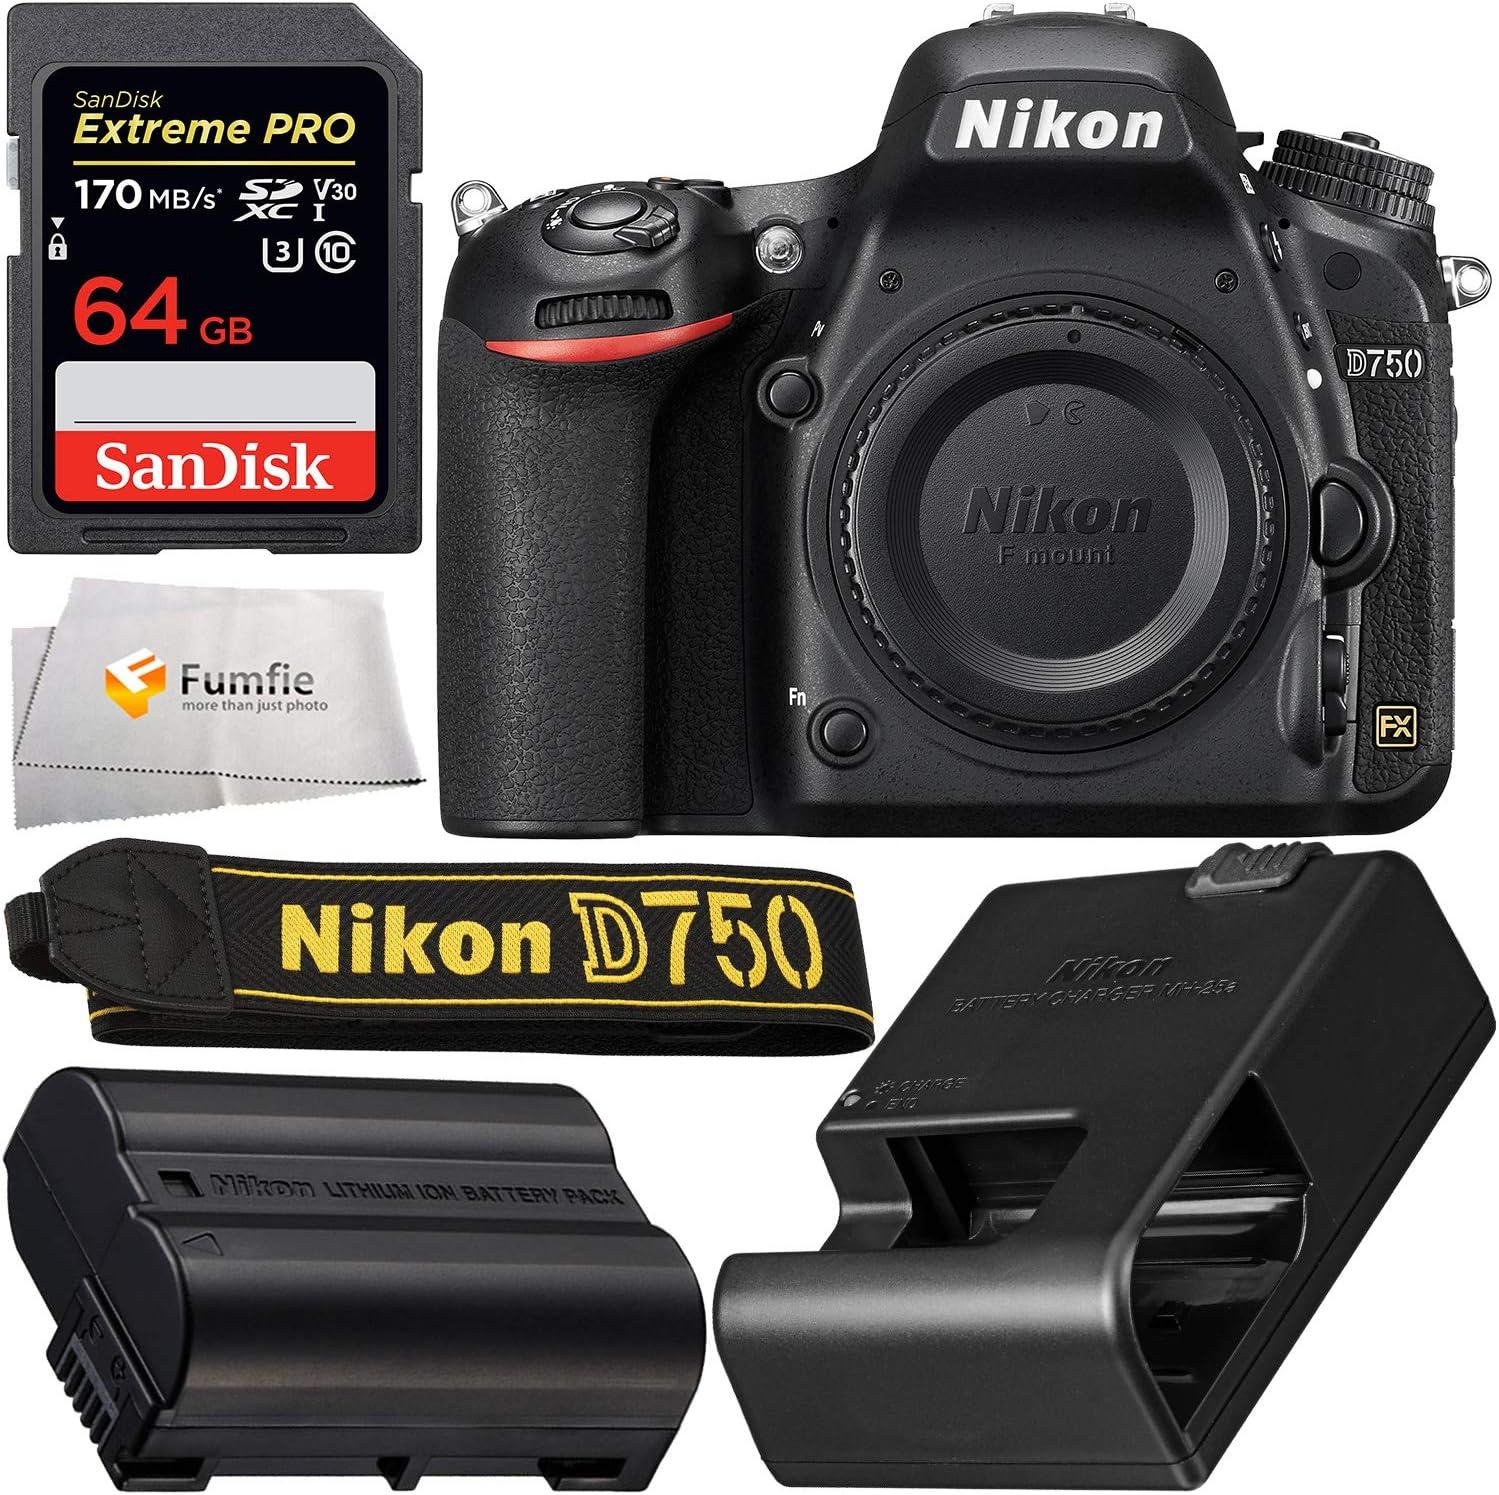 Nikon D750 DSLR Camera: Includes Promotional SanDisk Extreme PRO 64GB SDXC Memory Card